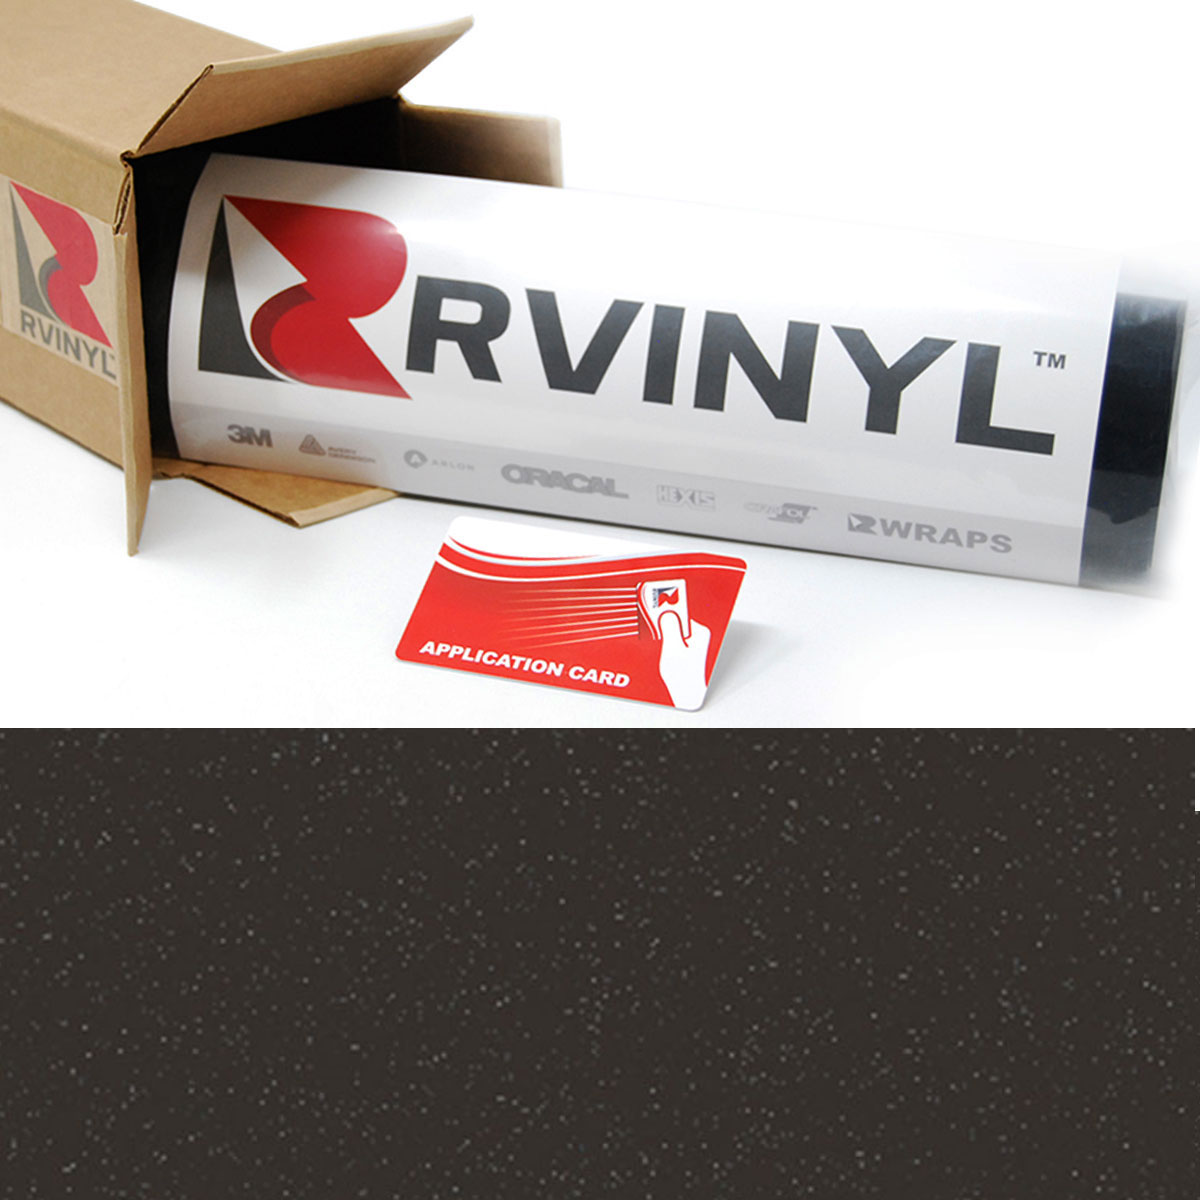 3m Controltac 180mc Charcoal Metallic Graphic Film